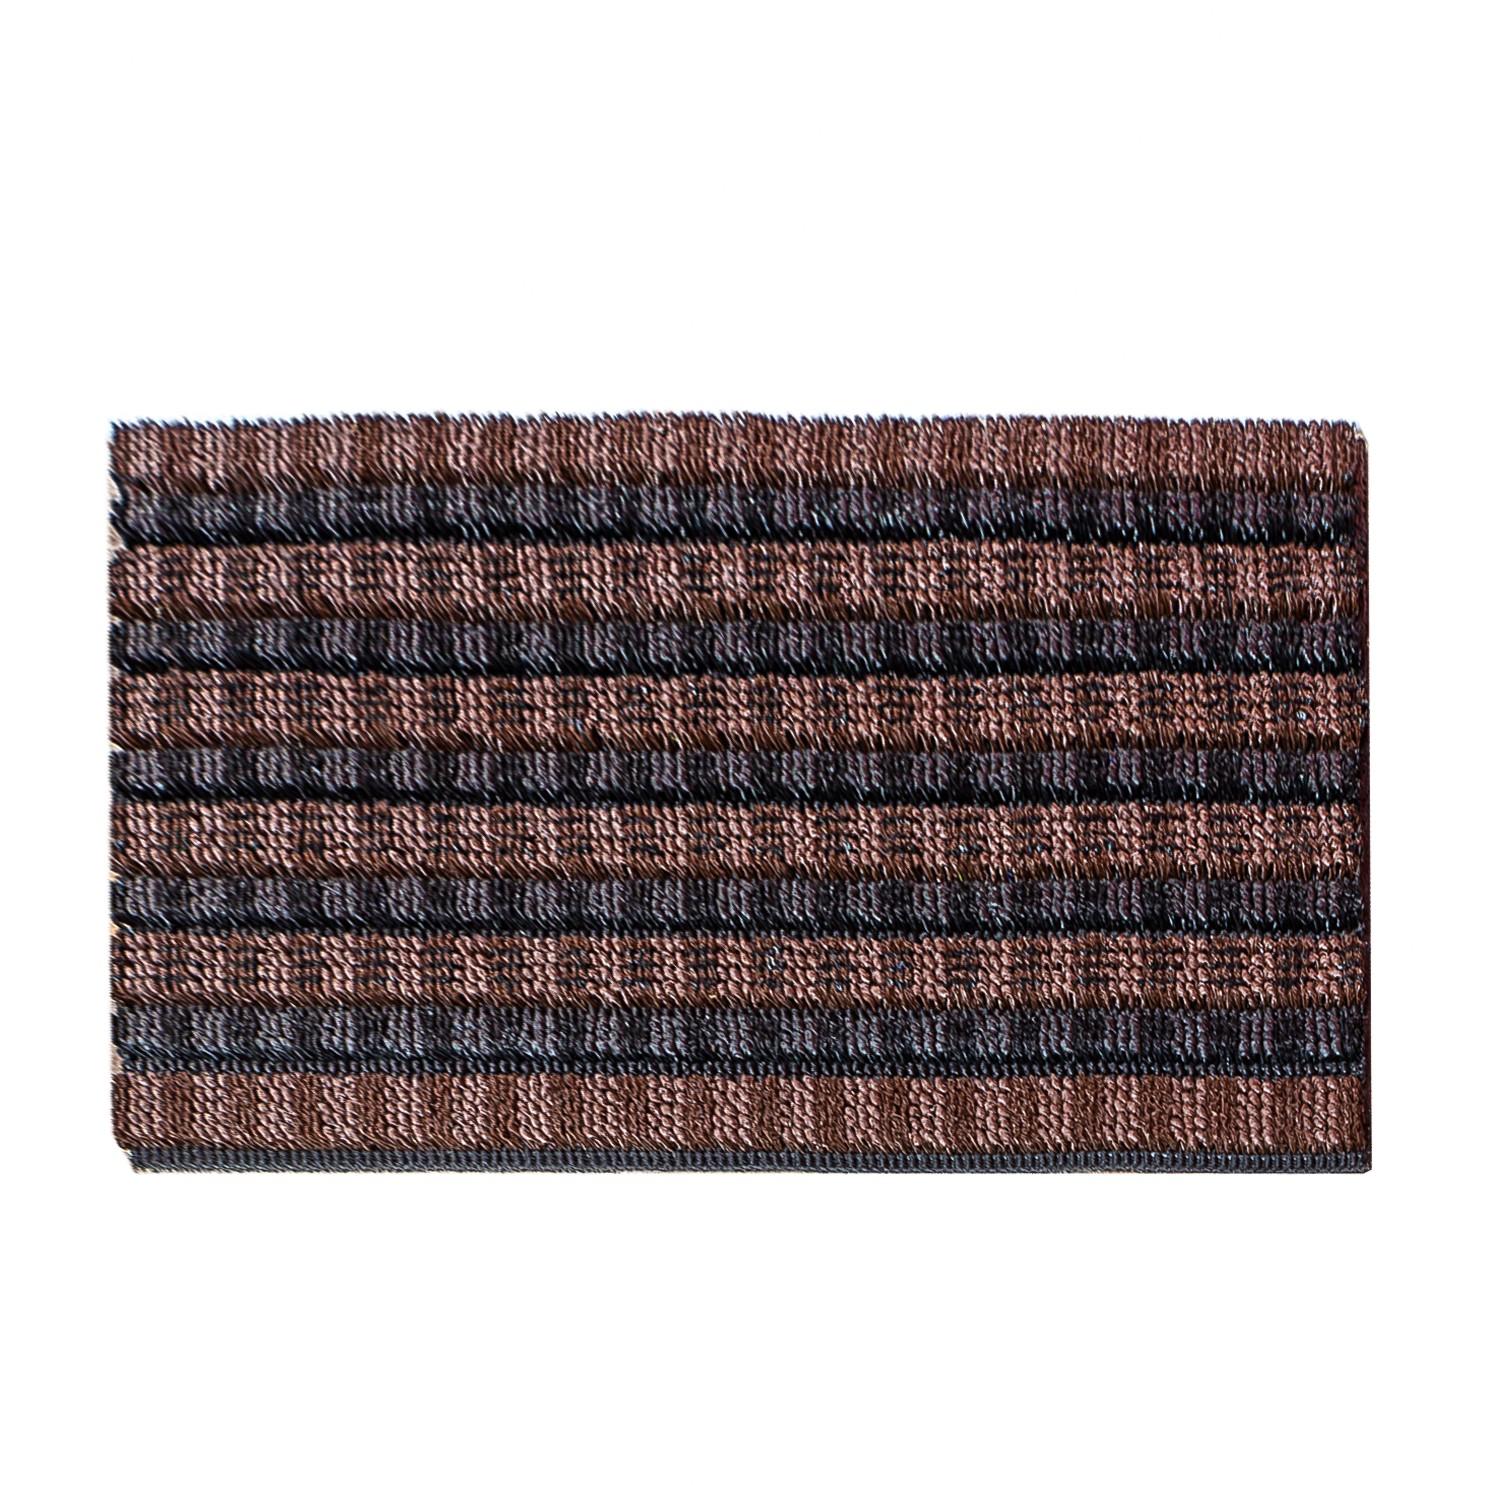 Fußmatte Poly Brush - Weinrot - 40 x 60 cm, Astra